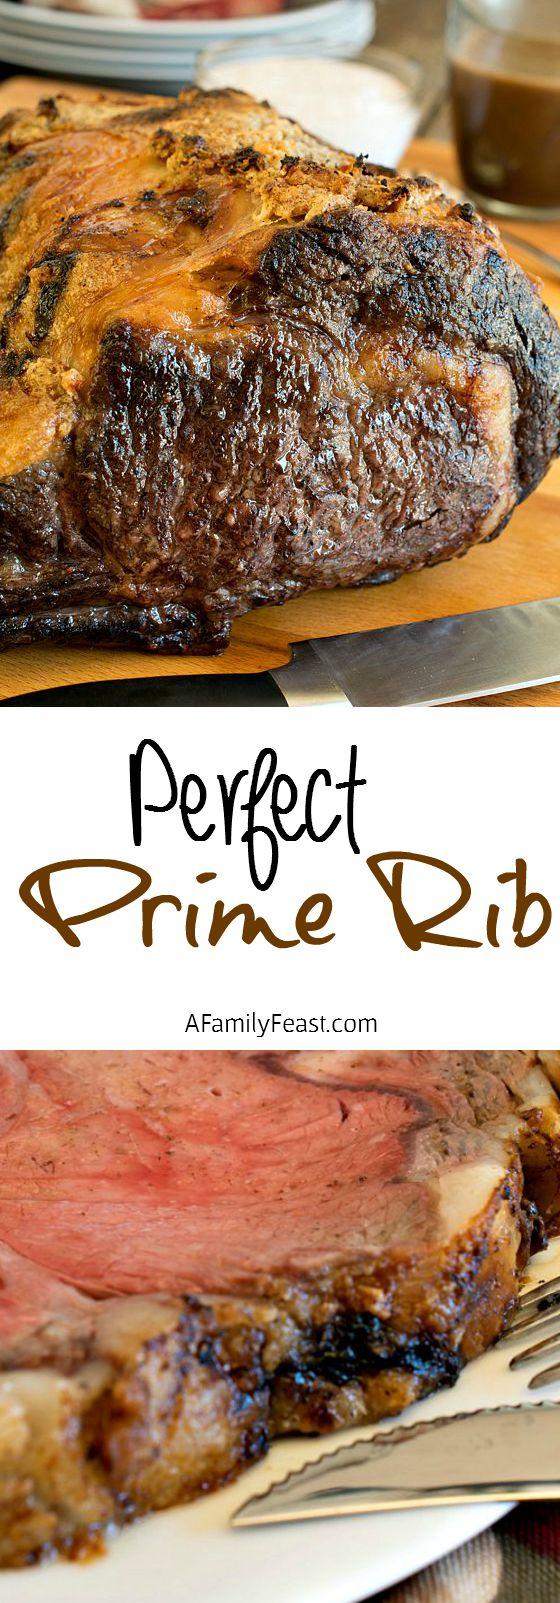 Perfect Prime Rib A Family Feast